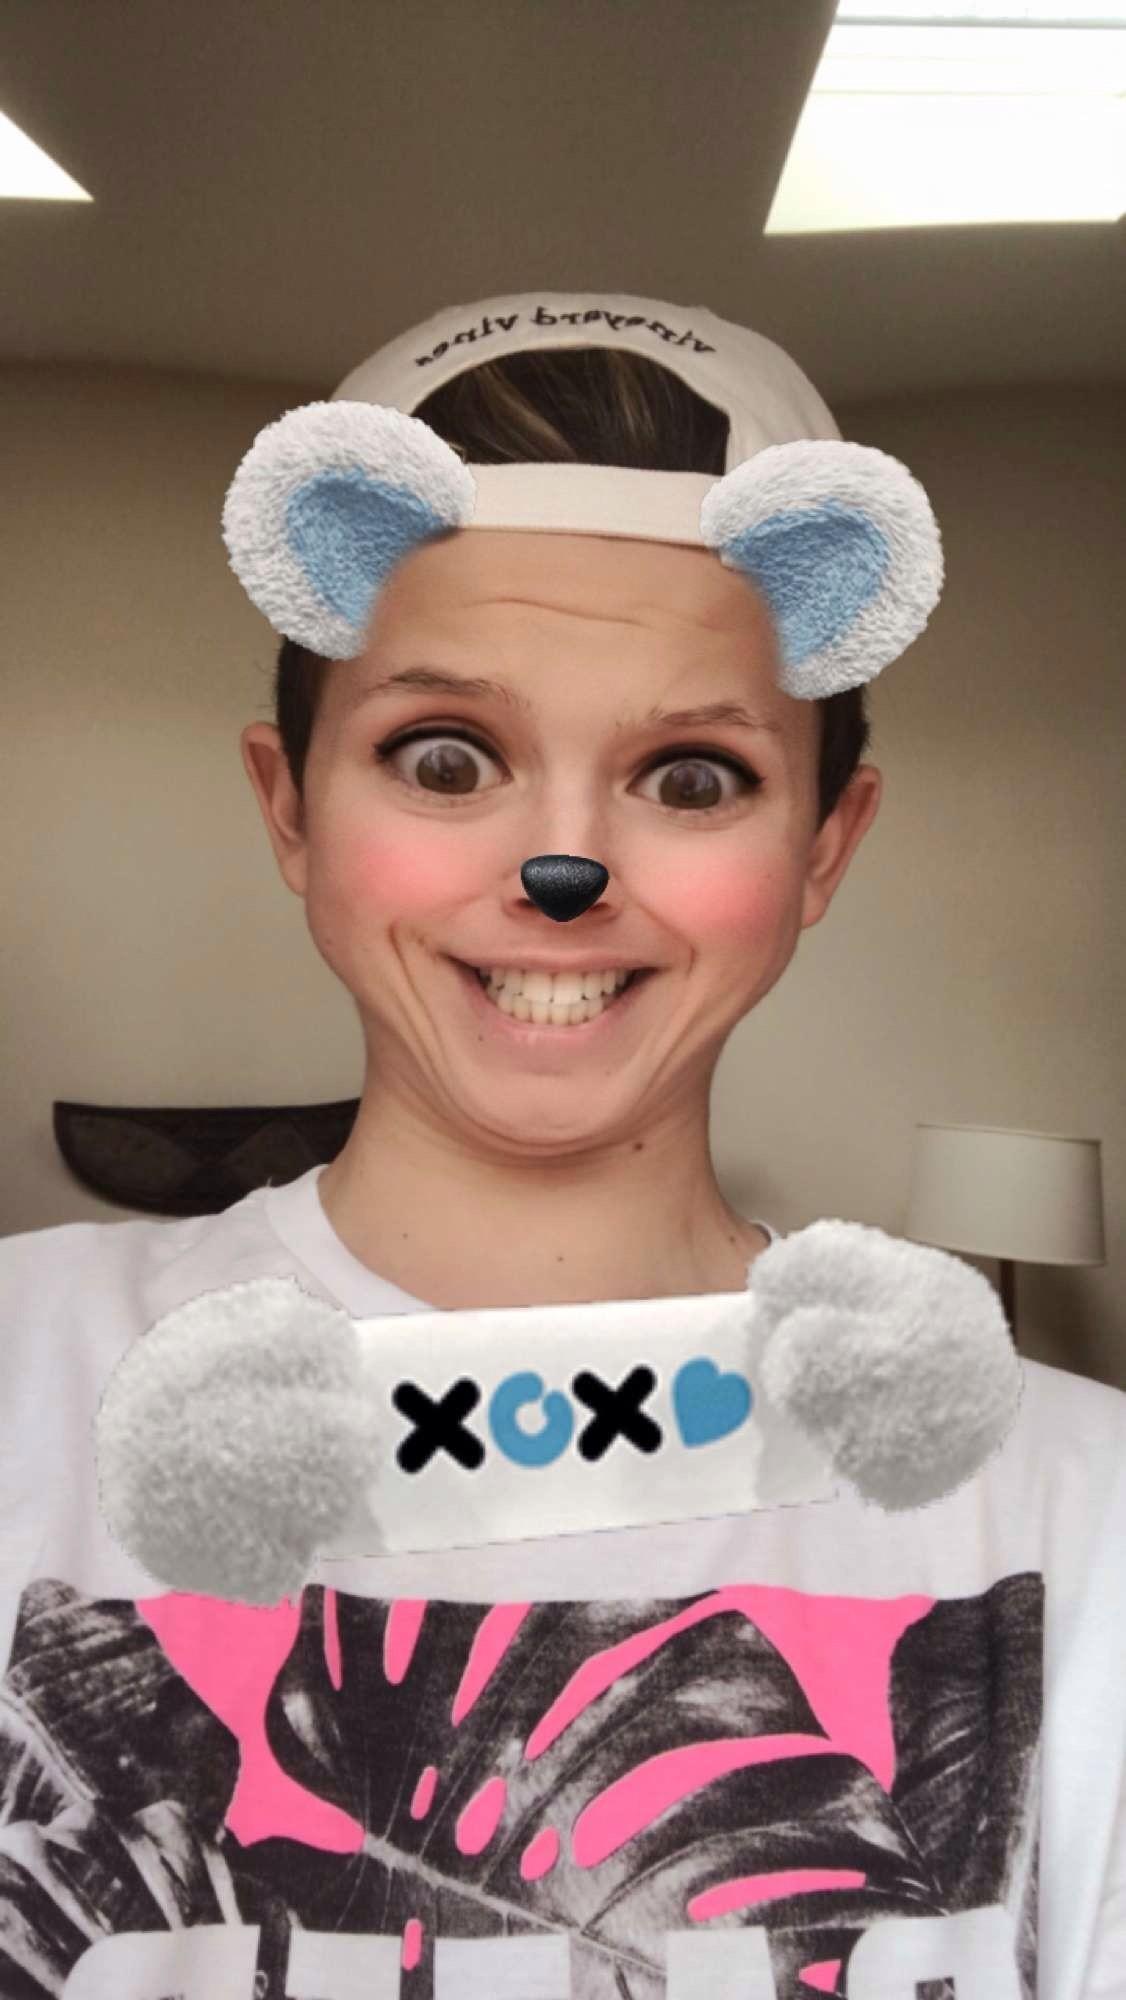 Jacob Sartorius, Hilarious, Life, Snapchat Filters, Paint, Flower, Baby  Boy, Bb, Dreams